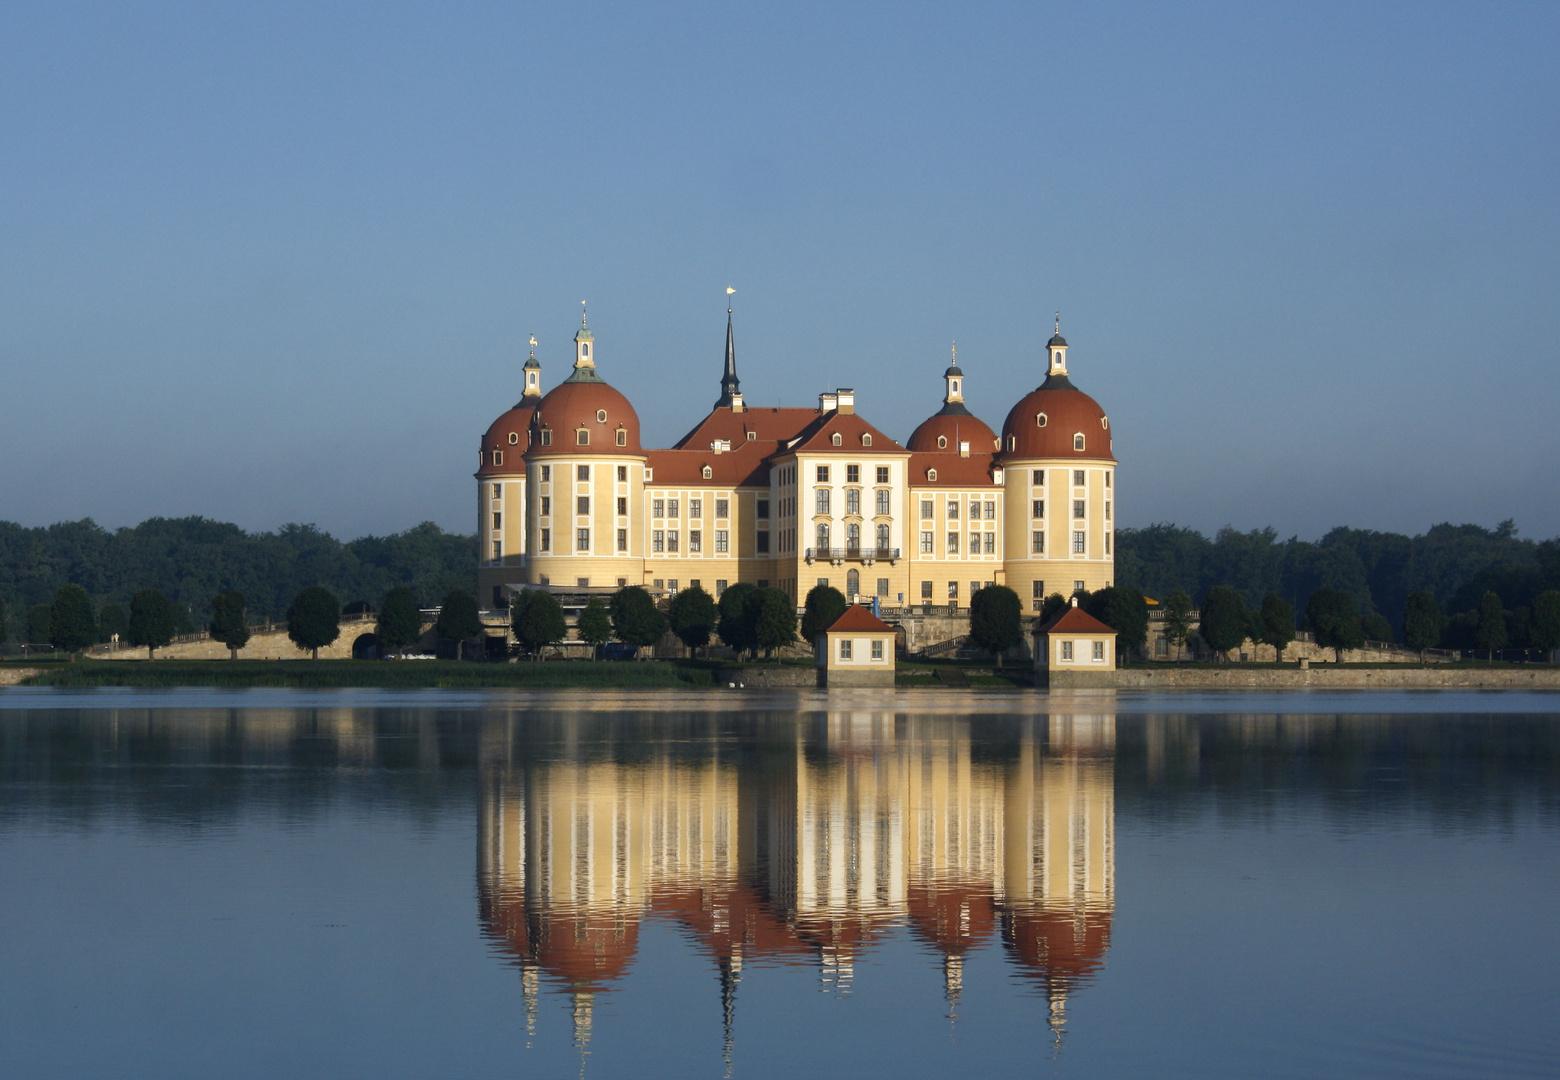 Barockschloß Moritzburg